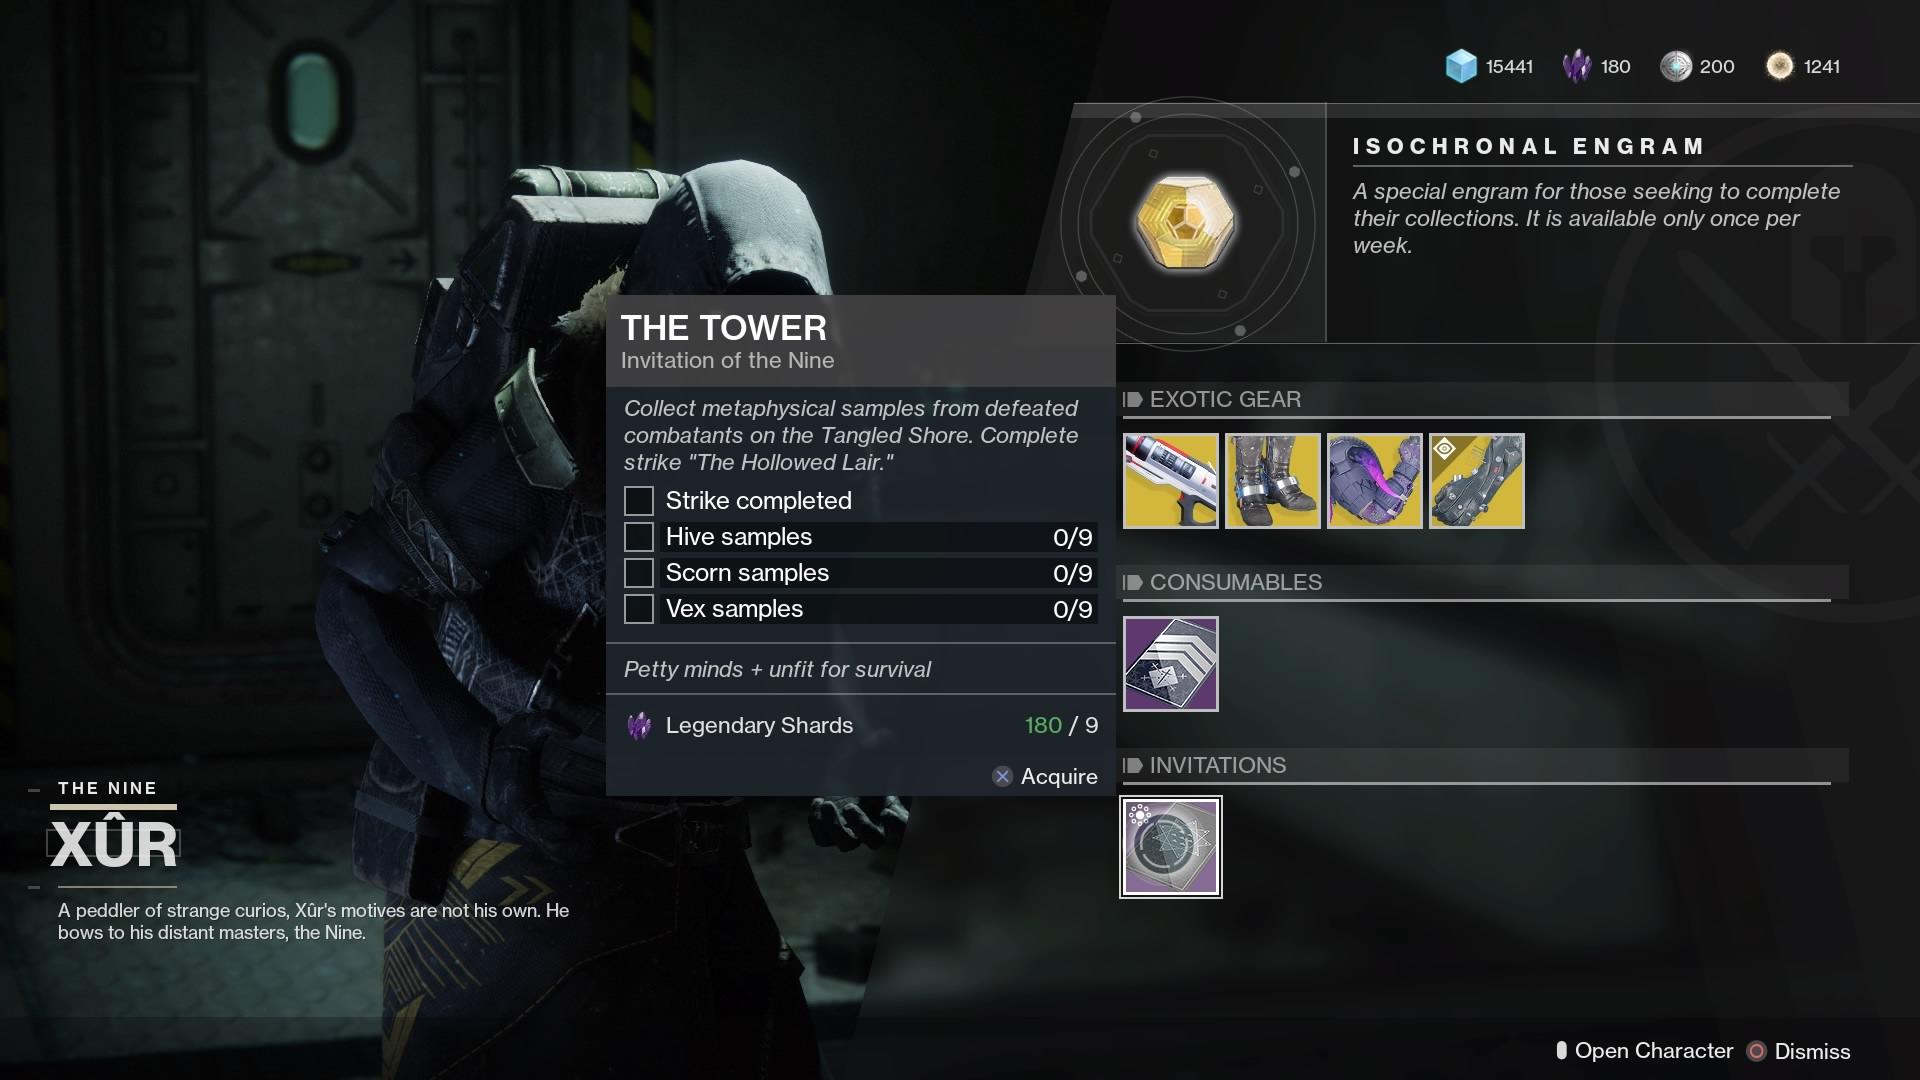 Destiny 2 The Tower Invitation of the Nine bounty